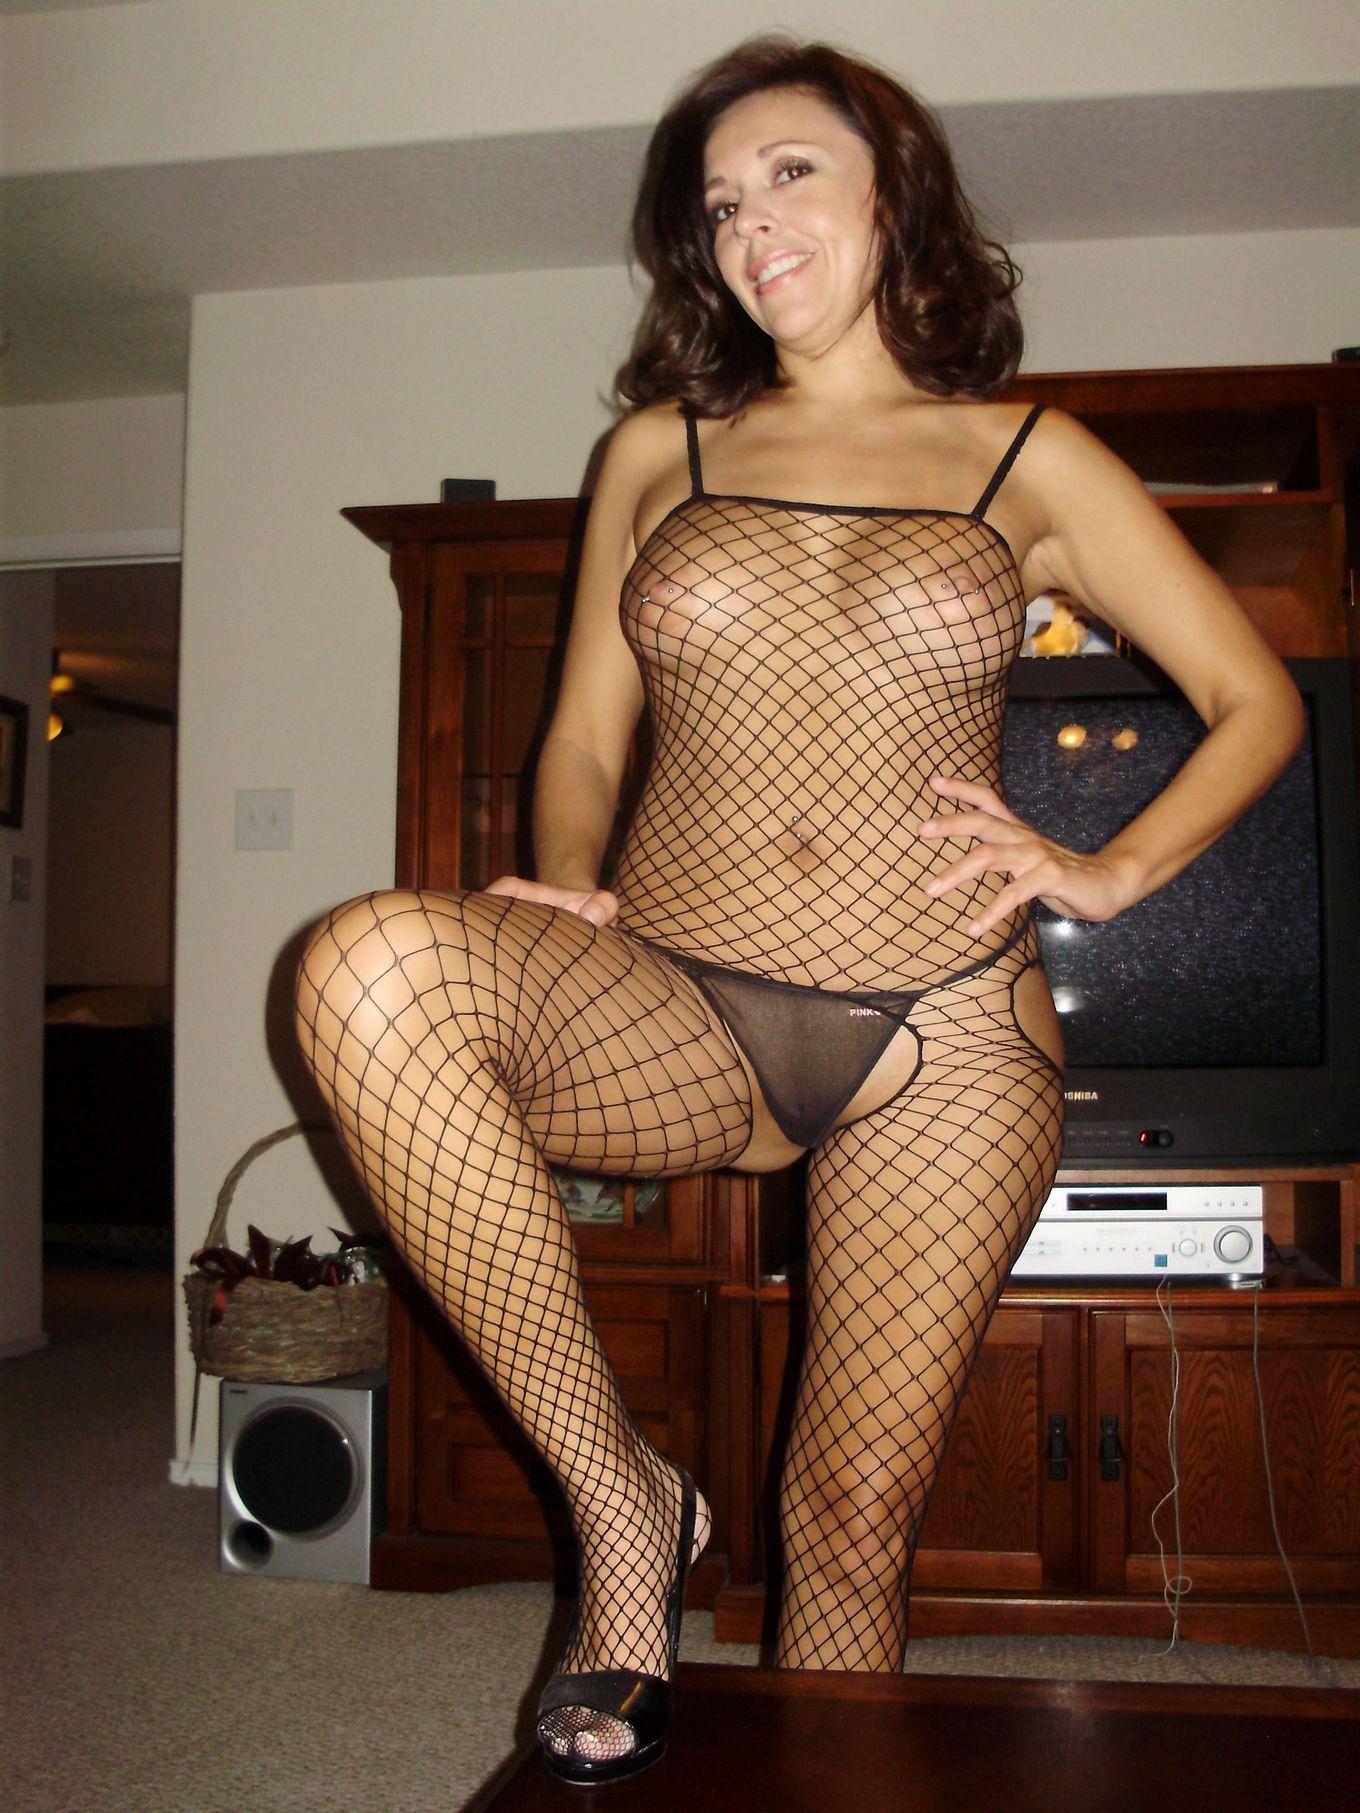 44-летняя полячка Сильвия